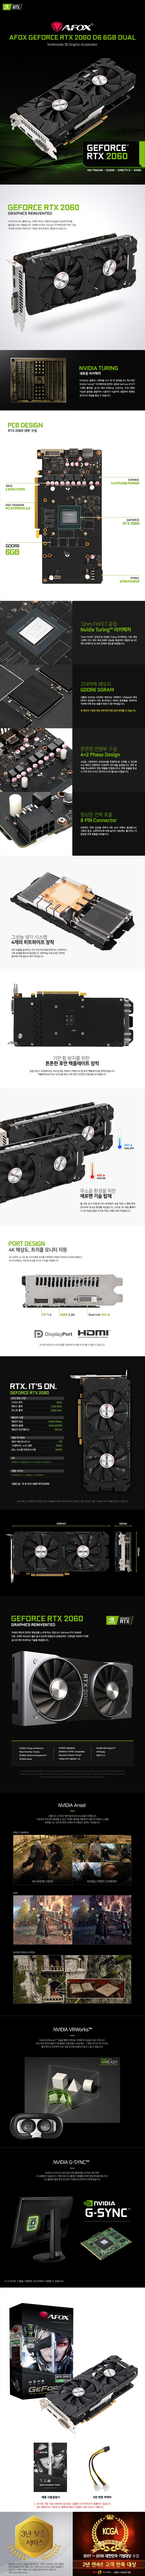 AFOX 지포스 RTX2060 D6 6GB 듀얼 백플레이트.jpg